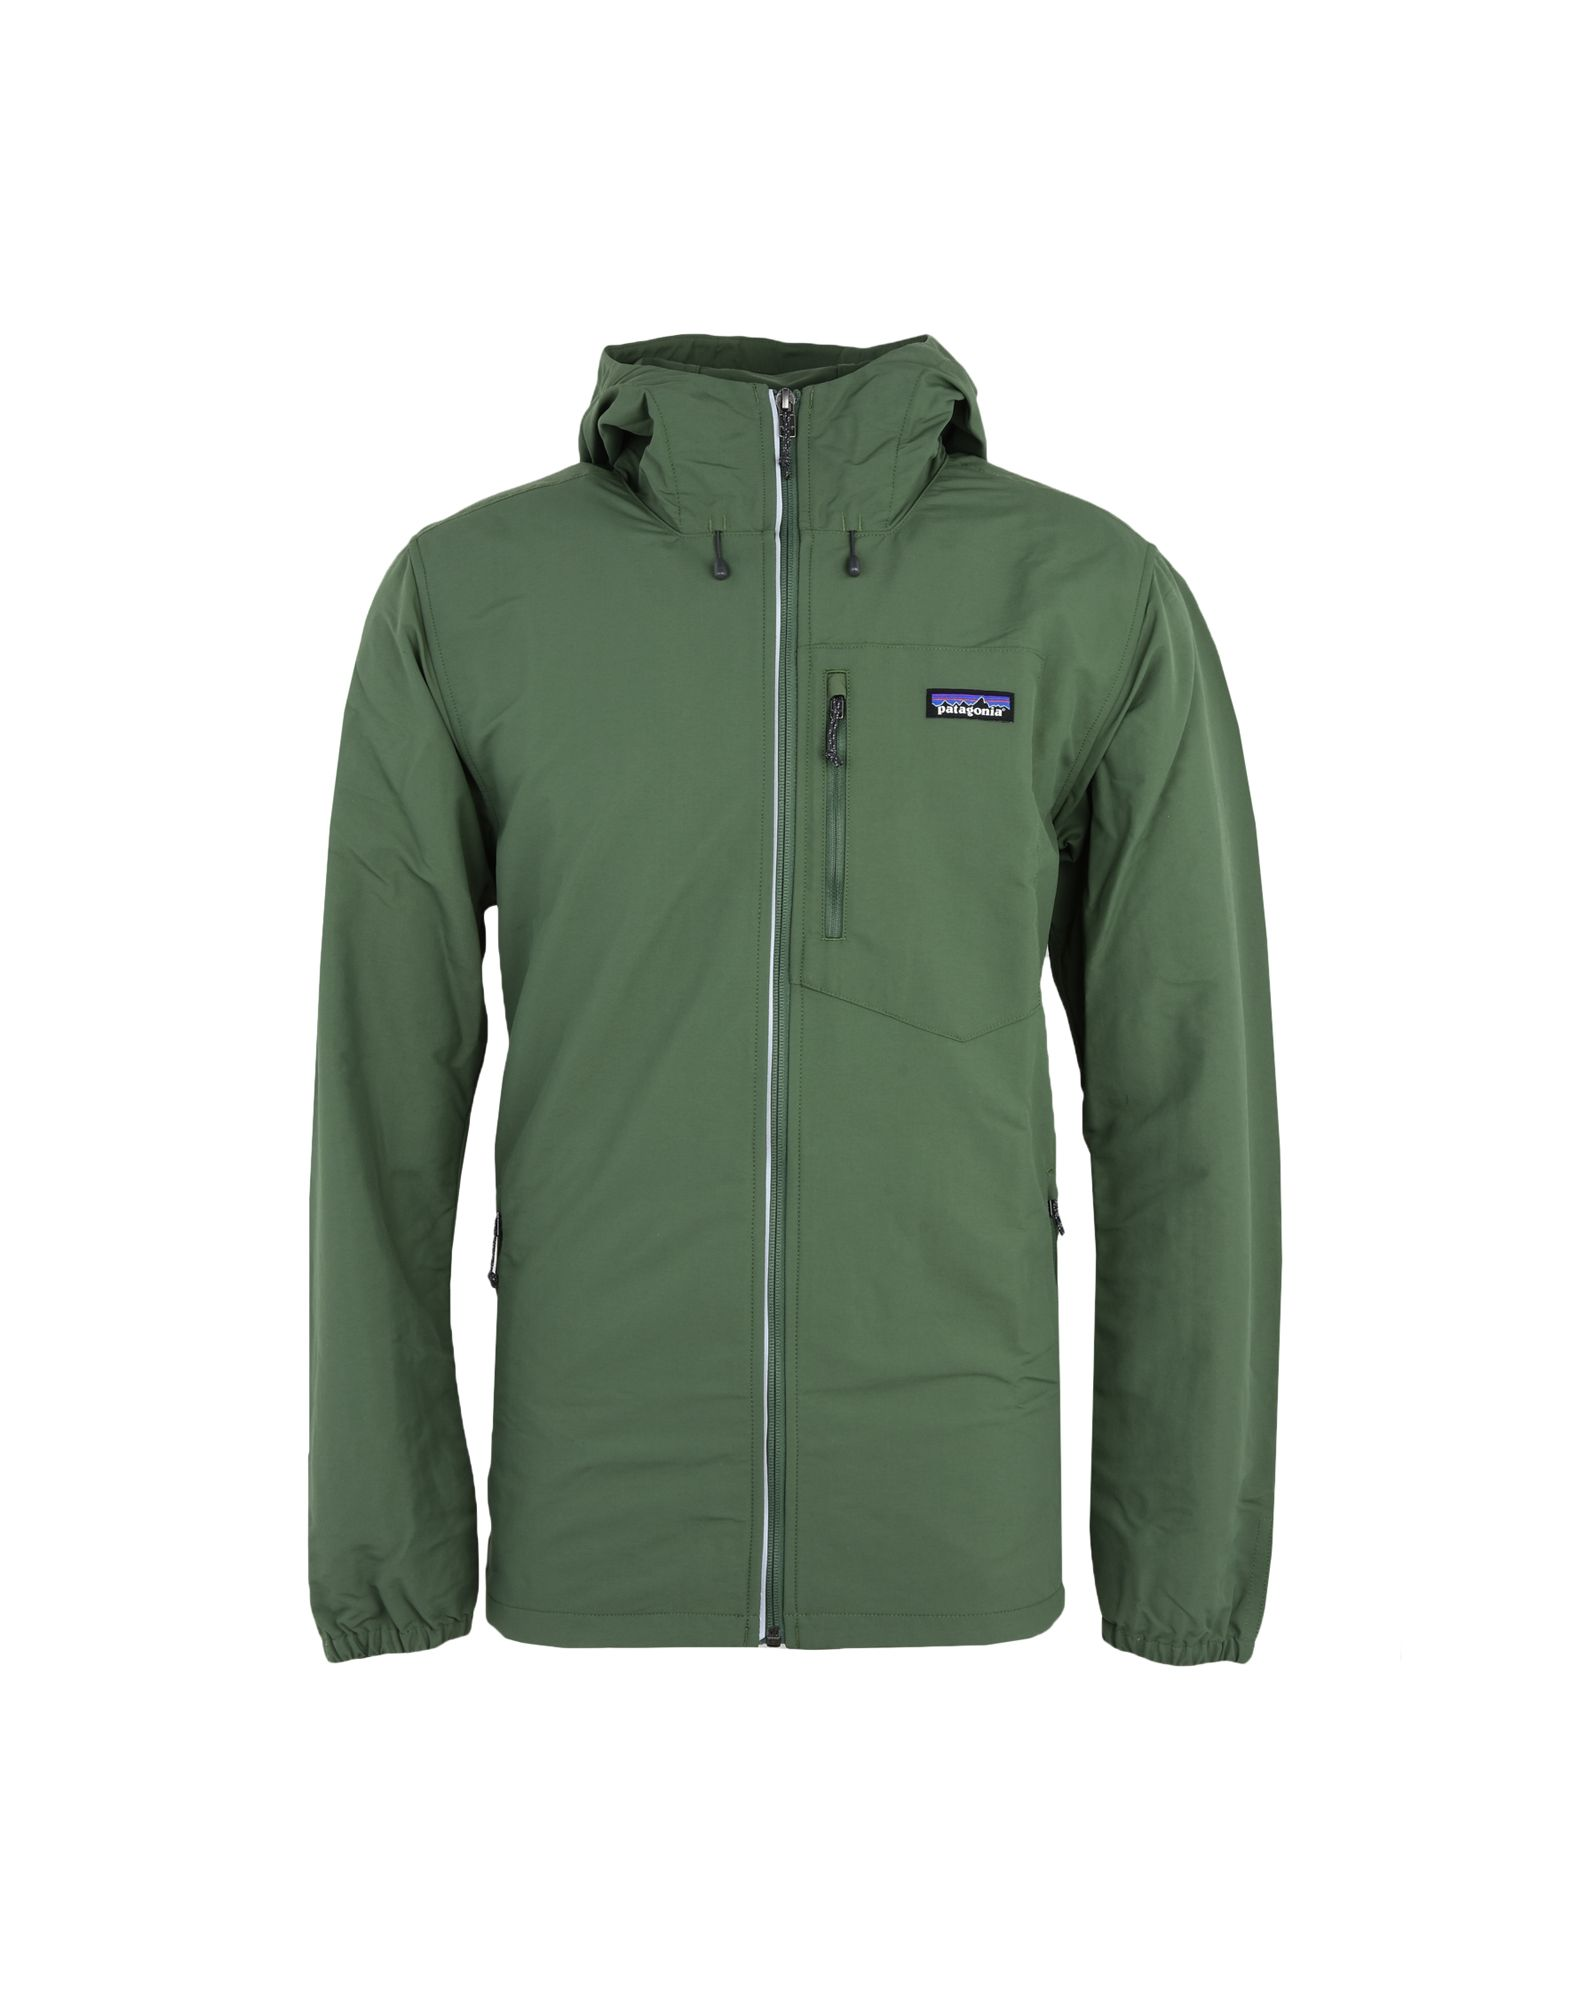 Giubbotto Patagonia Ms Tezzeron Jacket - Uomo - Acquista online su